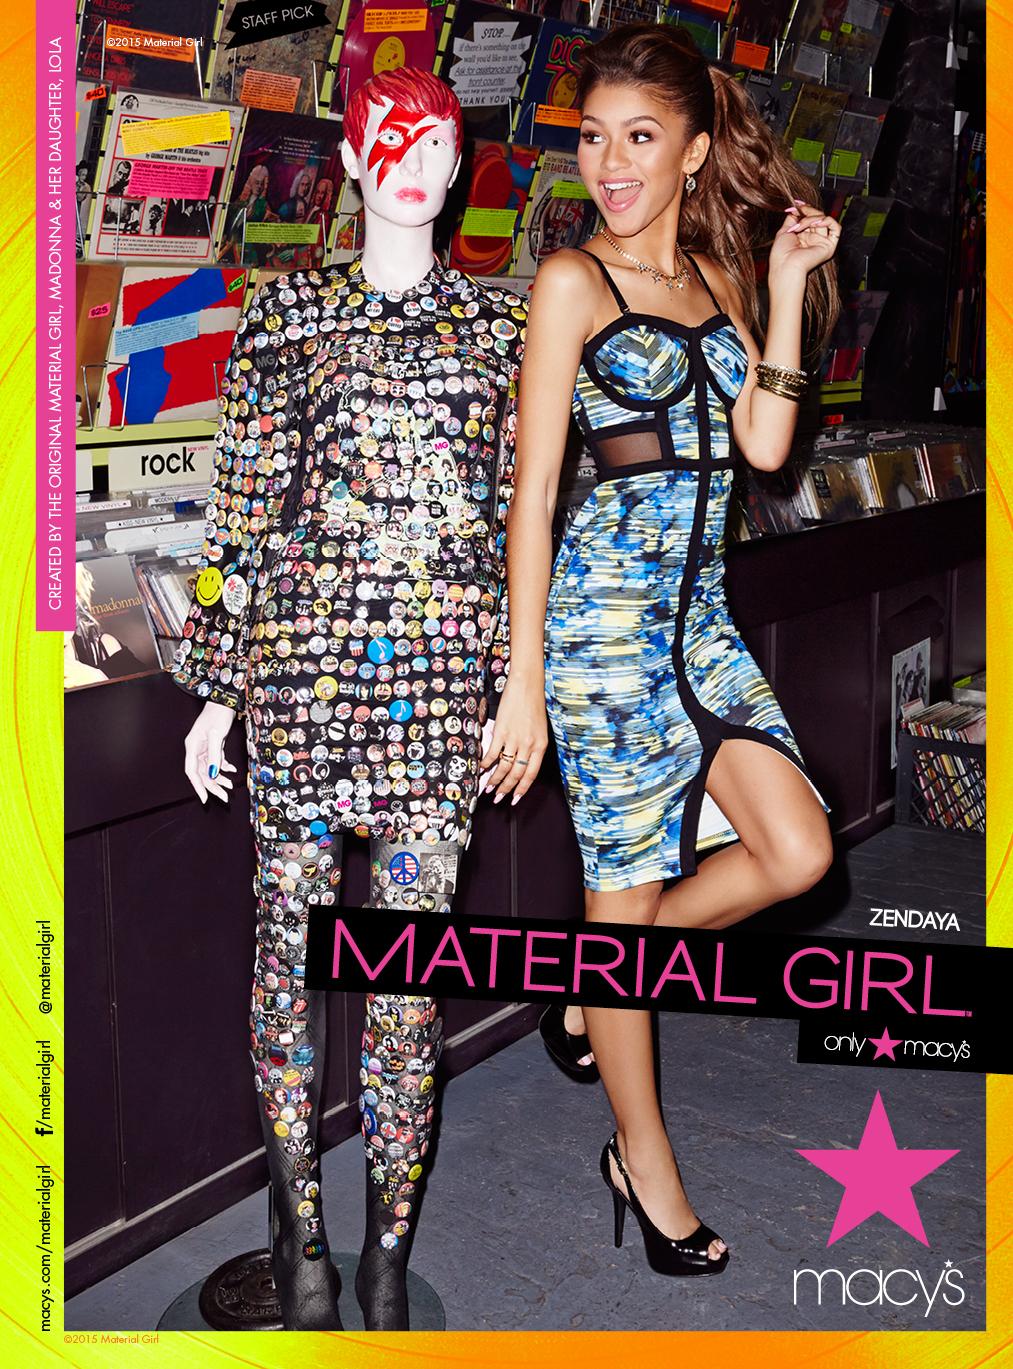 Zendaya for Material Girl.